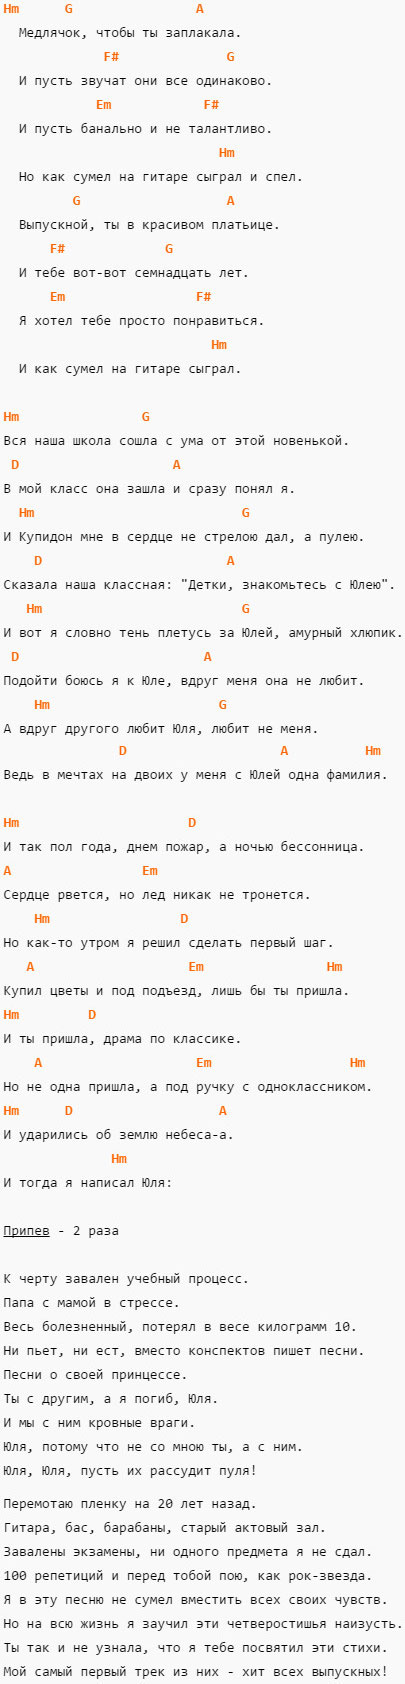 Медлячок - Баста - Аккорды и текст